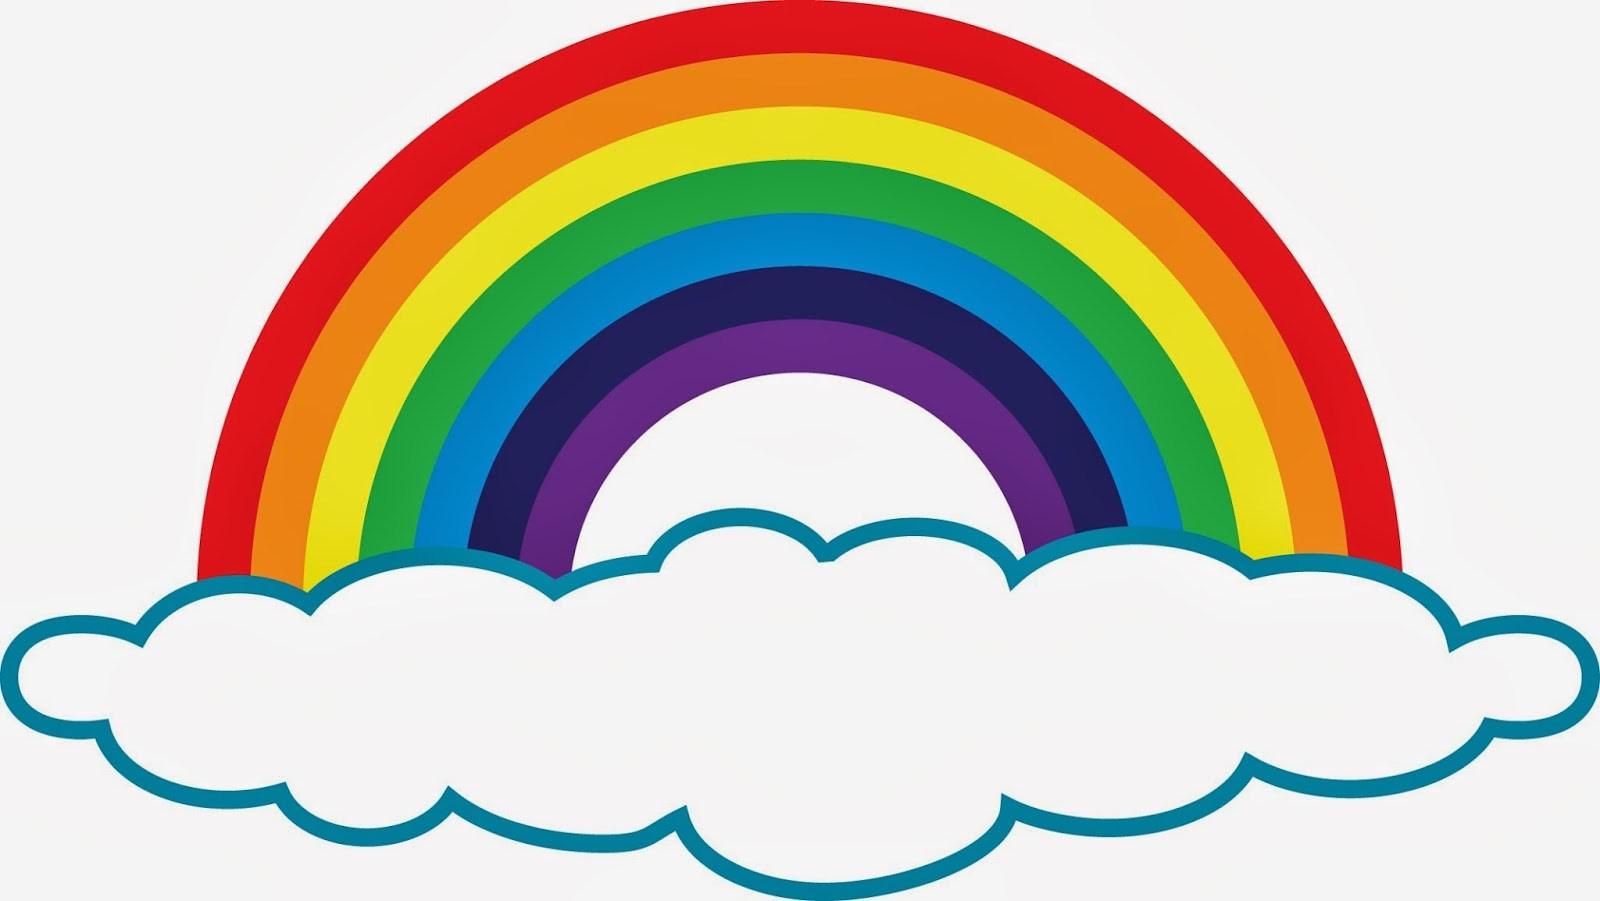 Rainbow cloud clipart 1 » Clipart Portal.